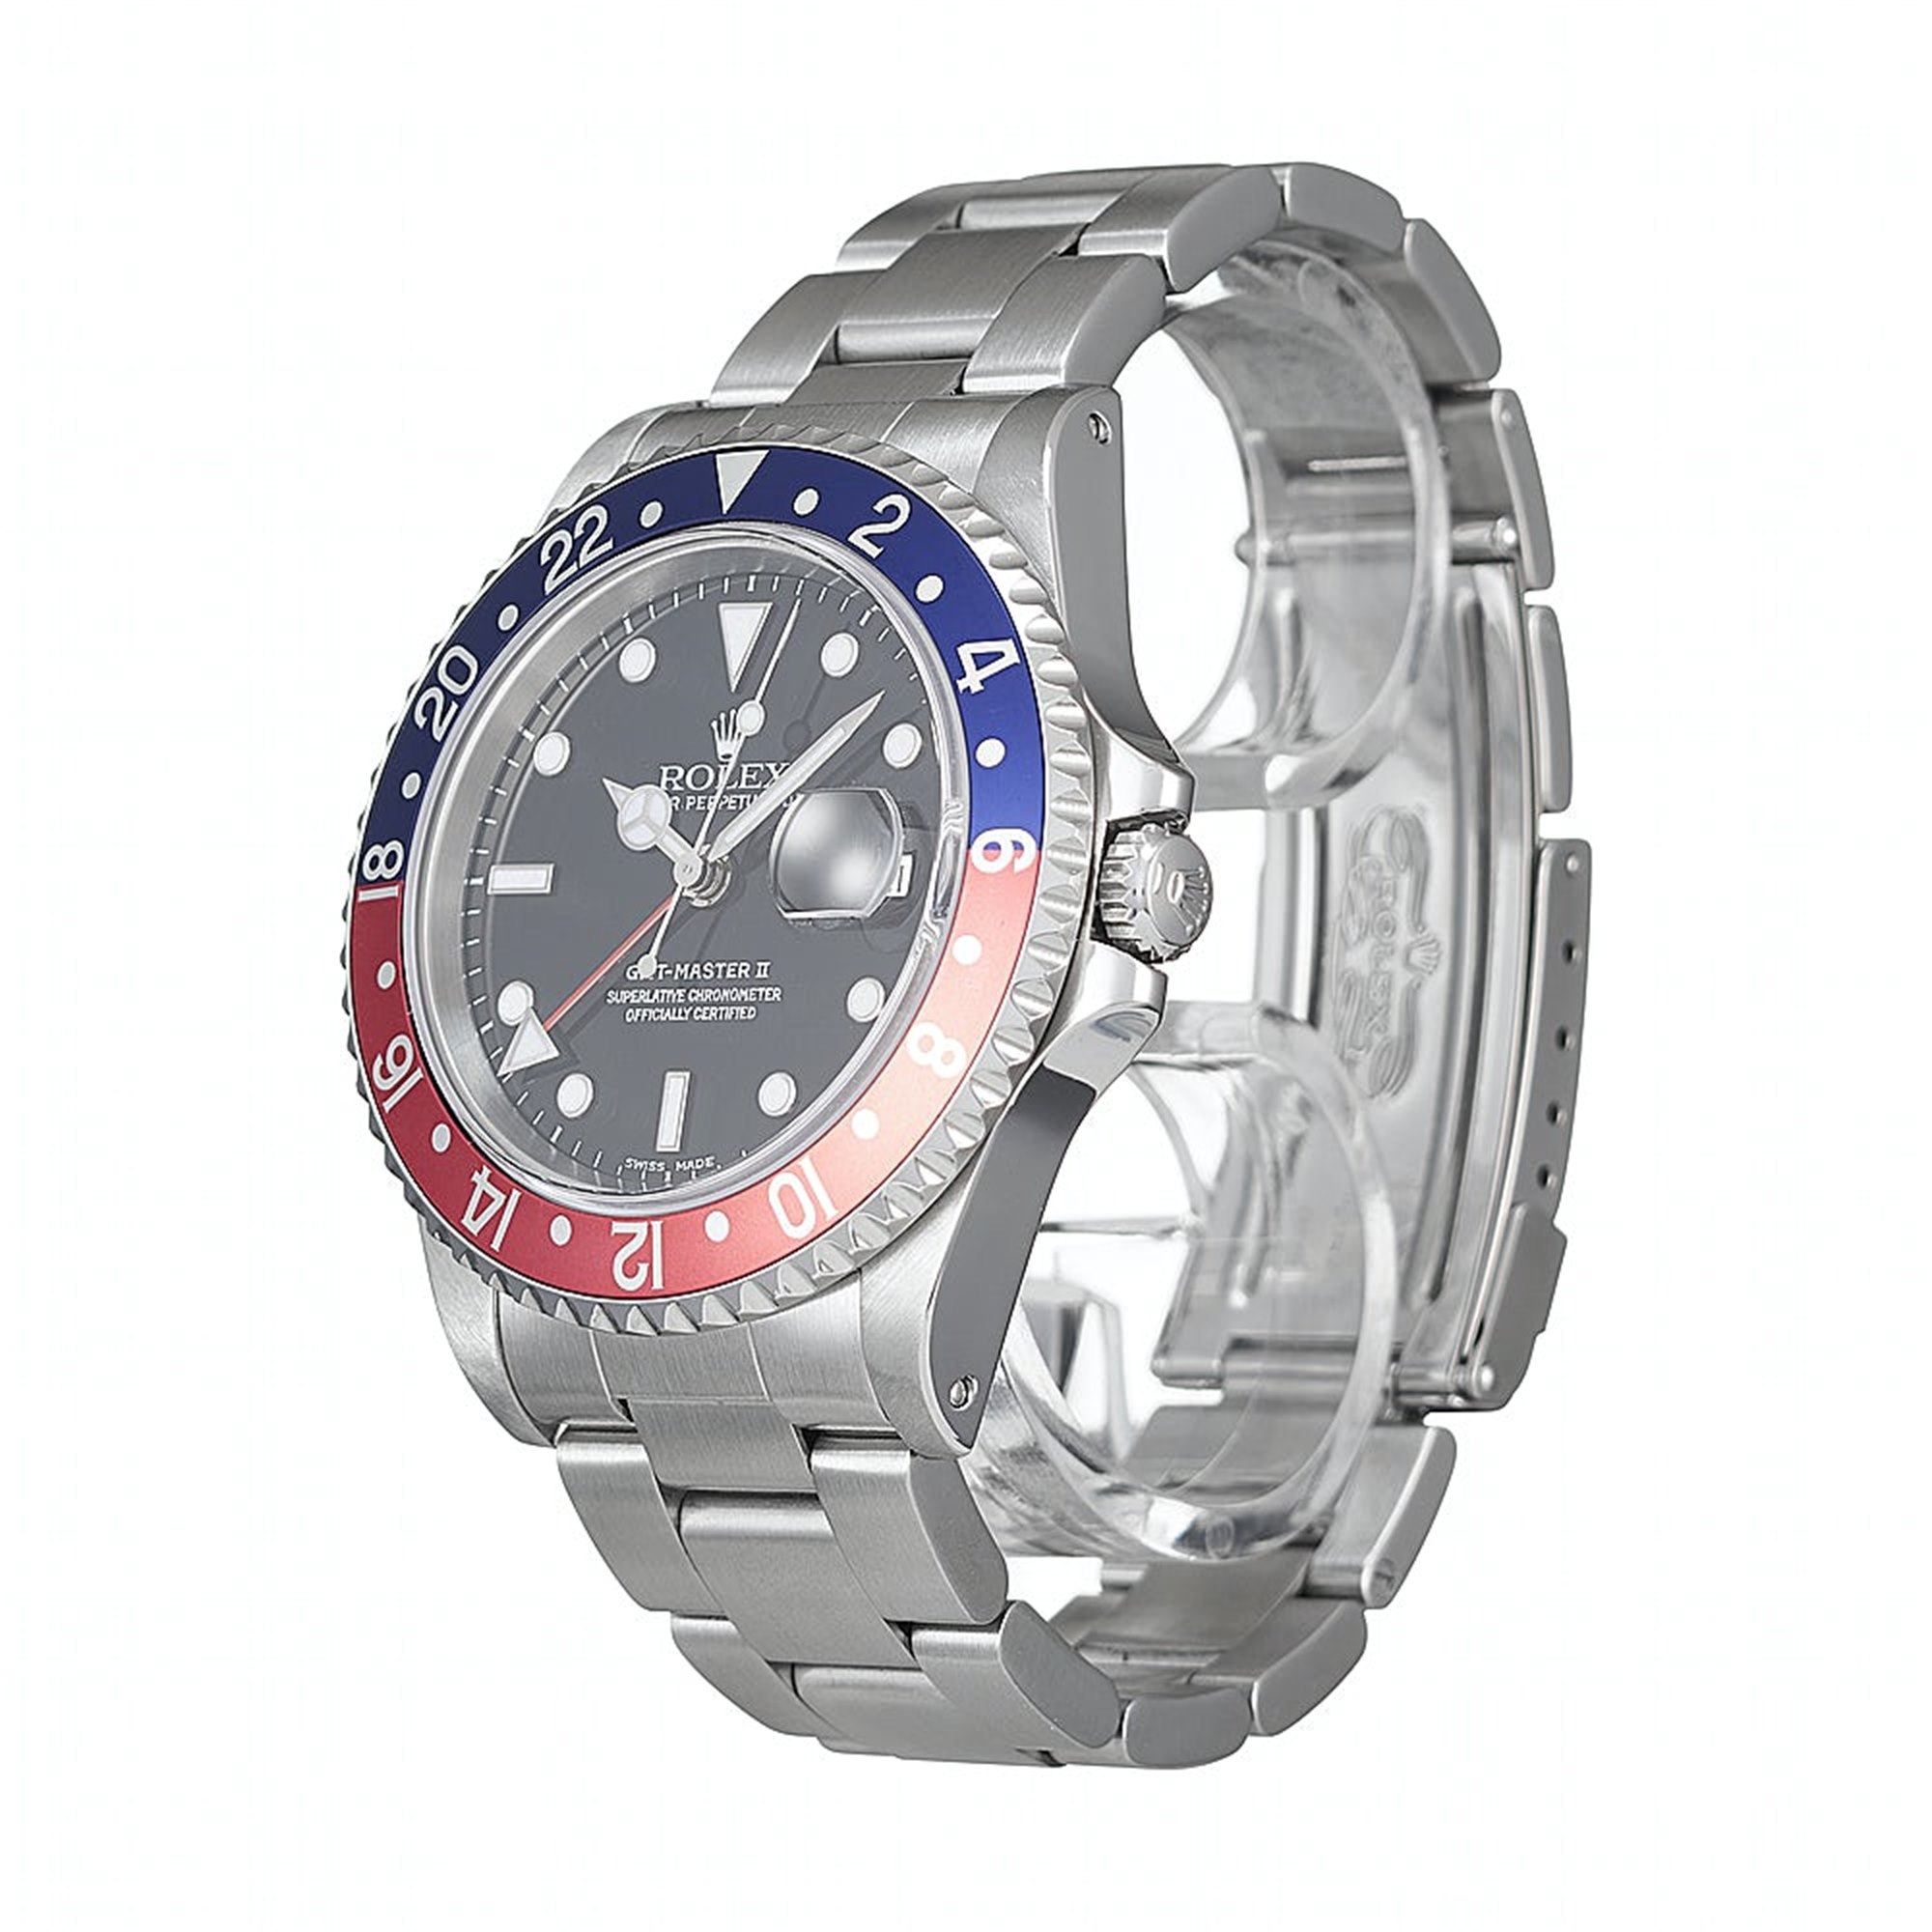 Rolex GMT-Master II Stainless Steel 16710